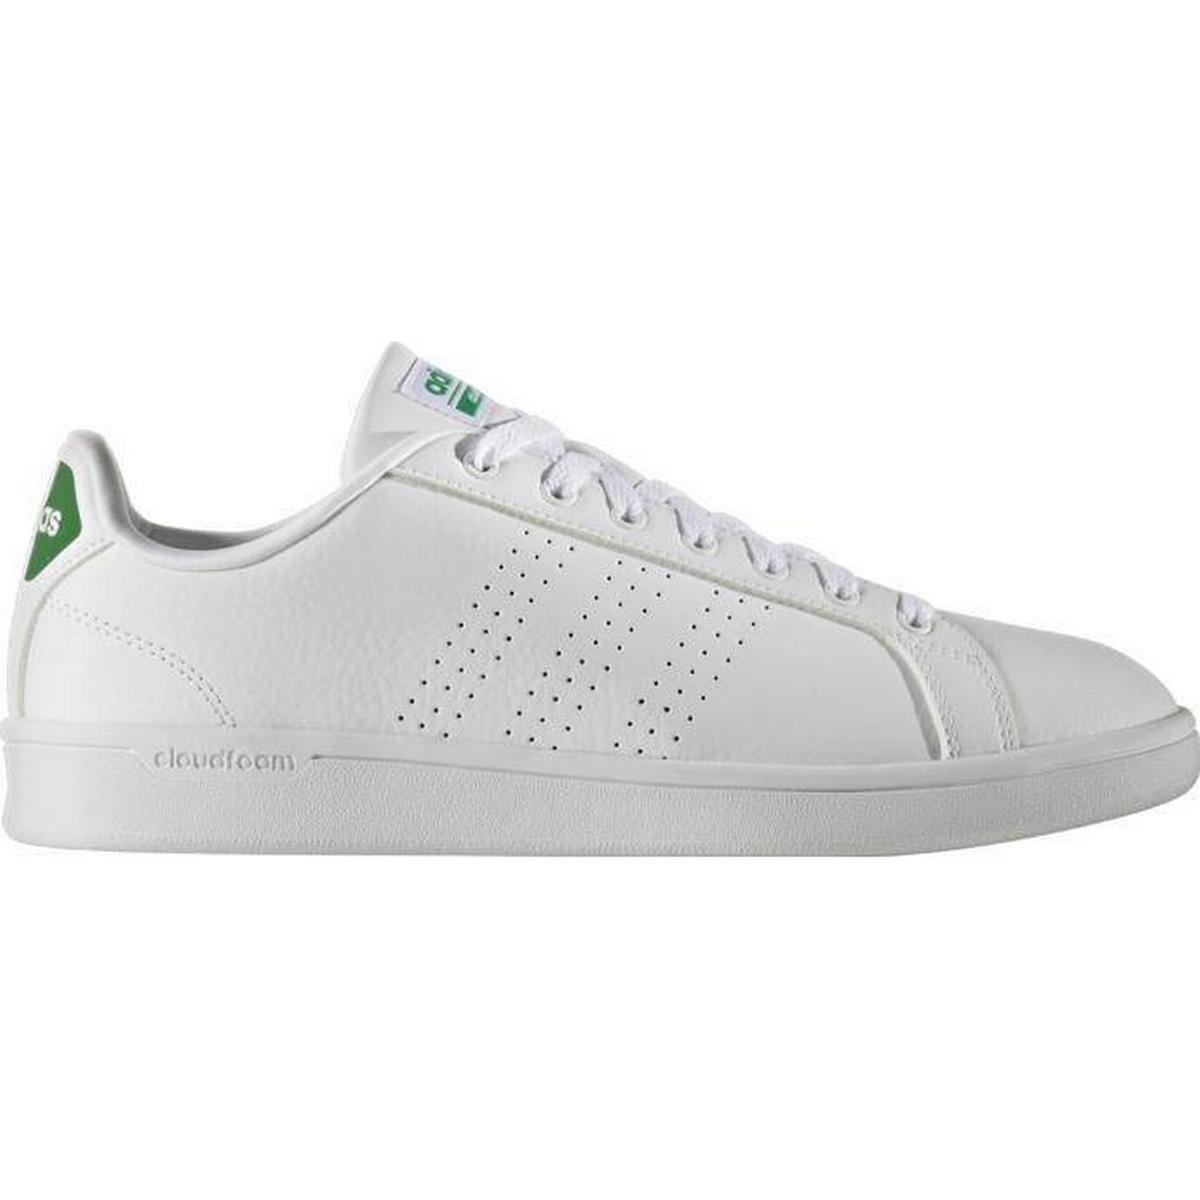 Advantage Adidas Kvinnors Dam Adapt Cloudfoam Athletic Shoes